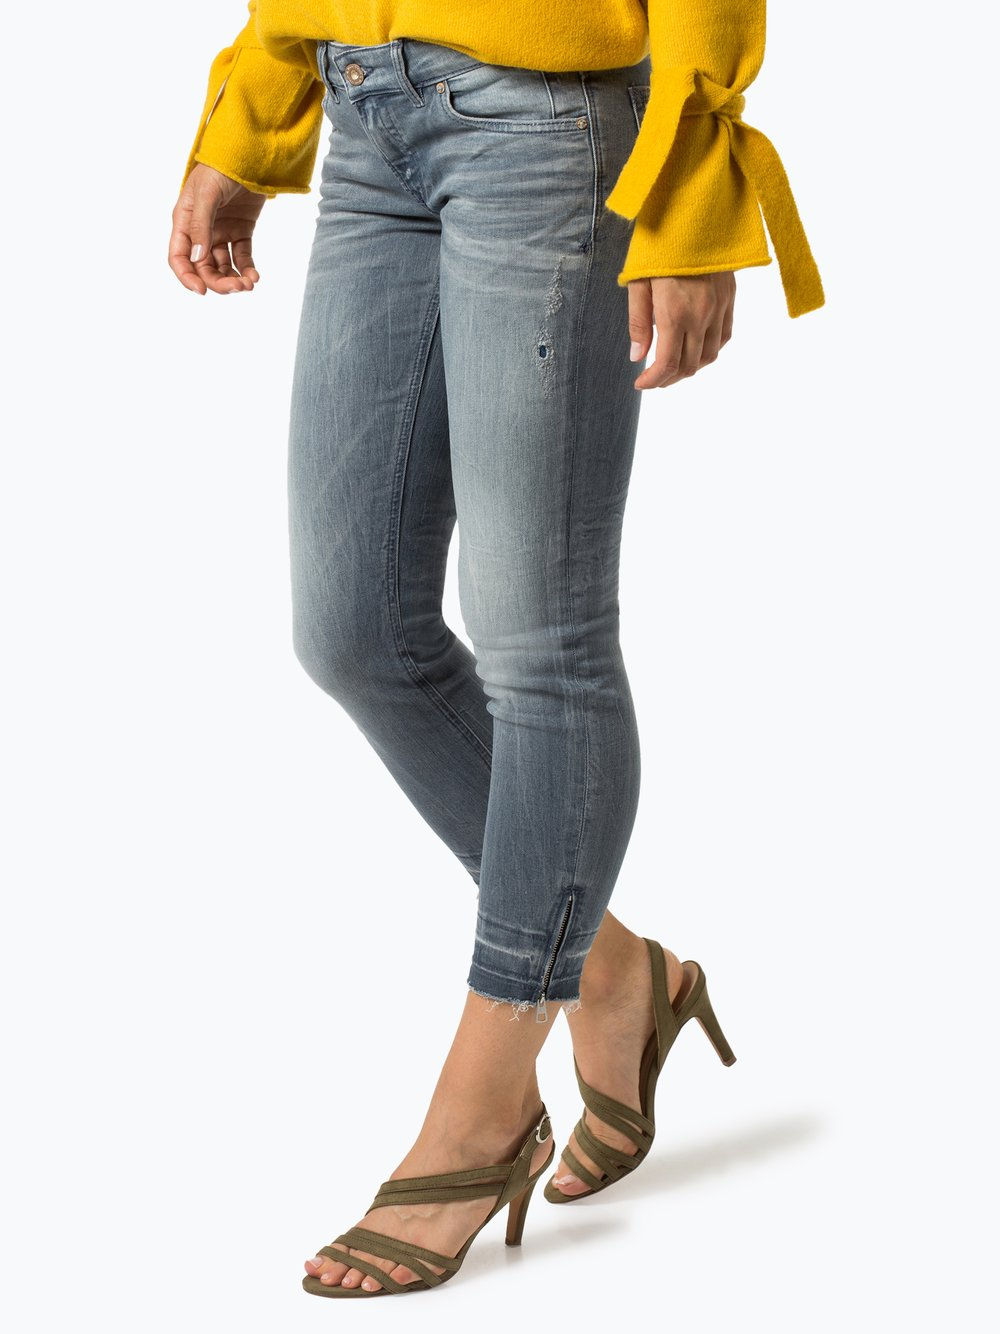 d5d6aeb8f7 Marc O'Polo Damen Jeans - Skara Slim online kaufen | VANGRAAF.COM